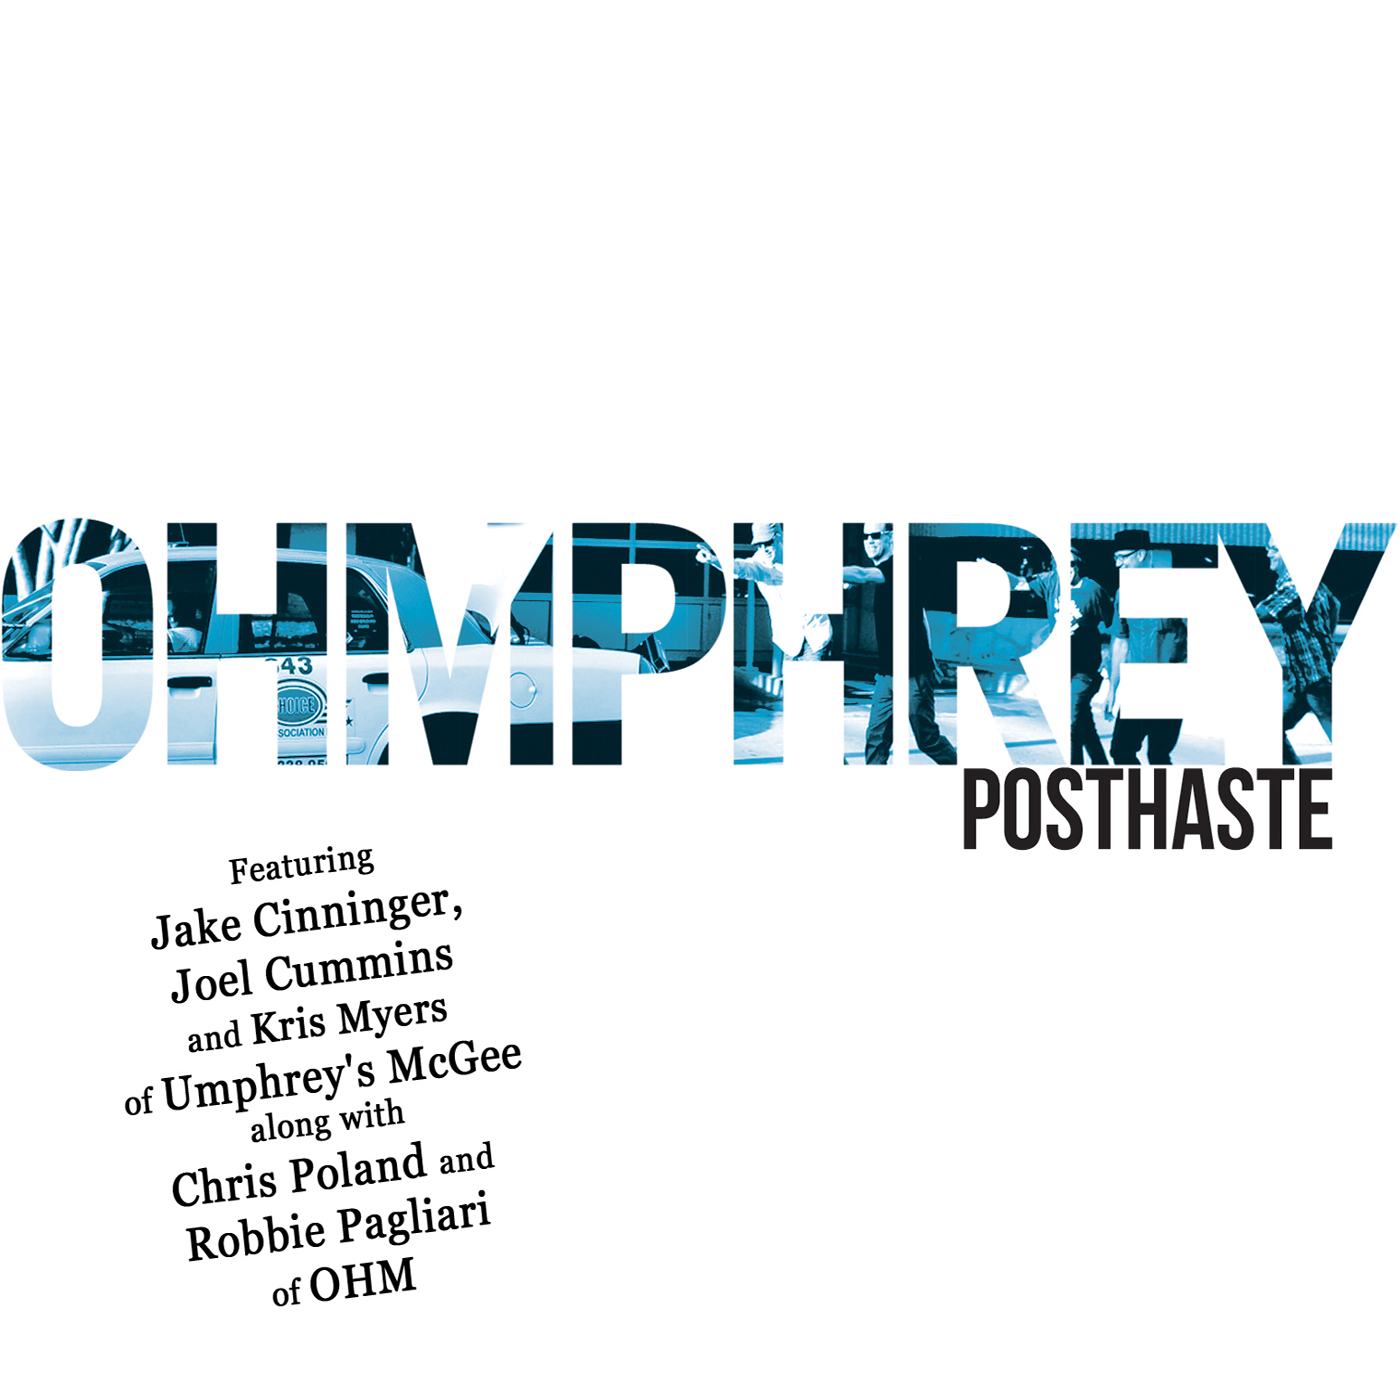 OHMphrey – Posthaste Review